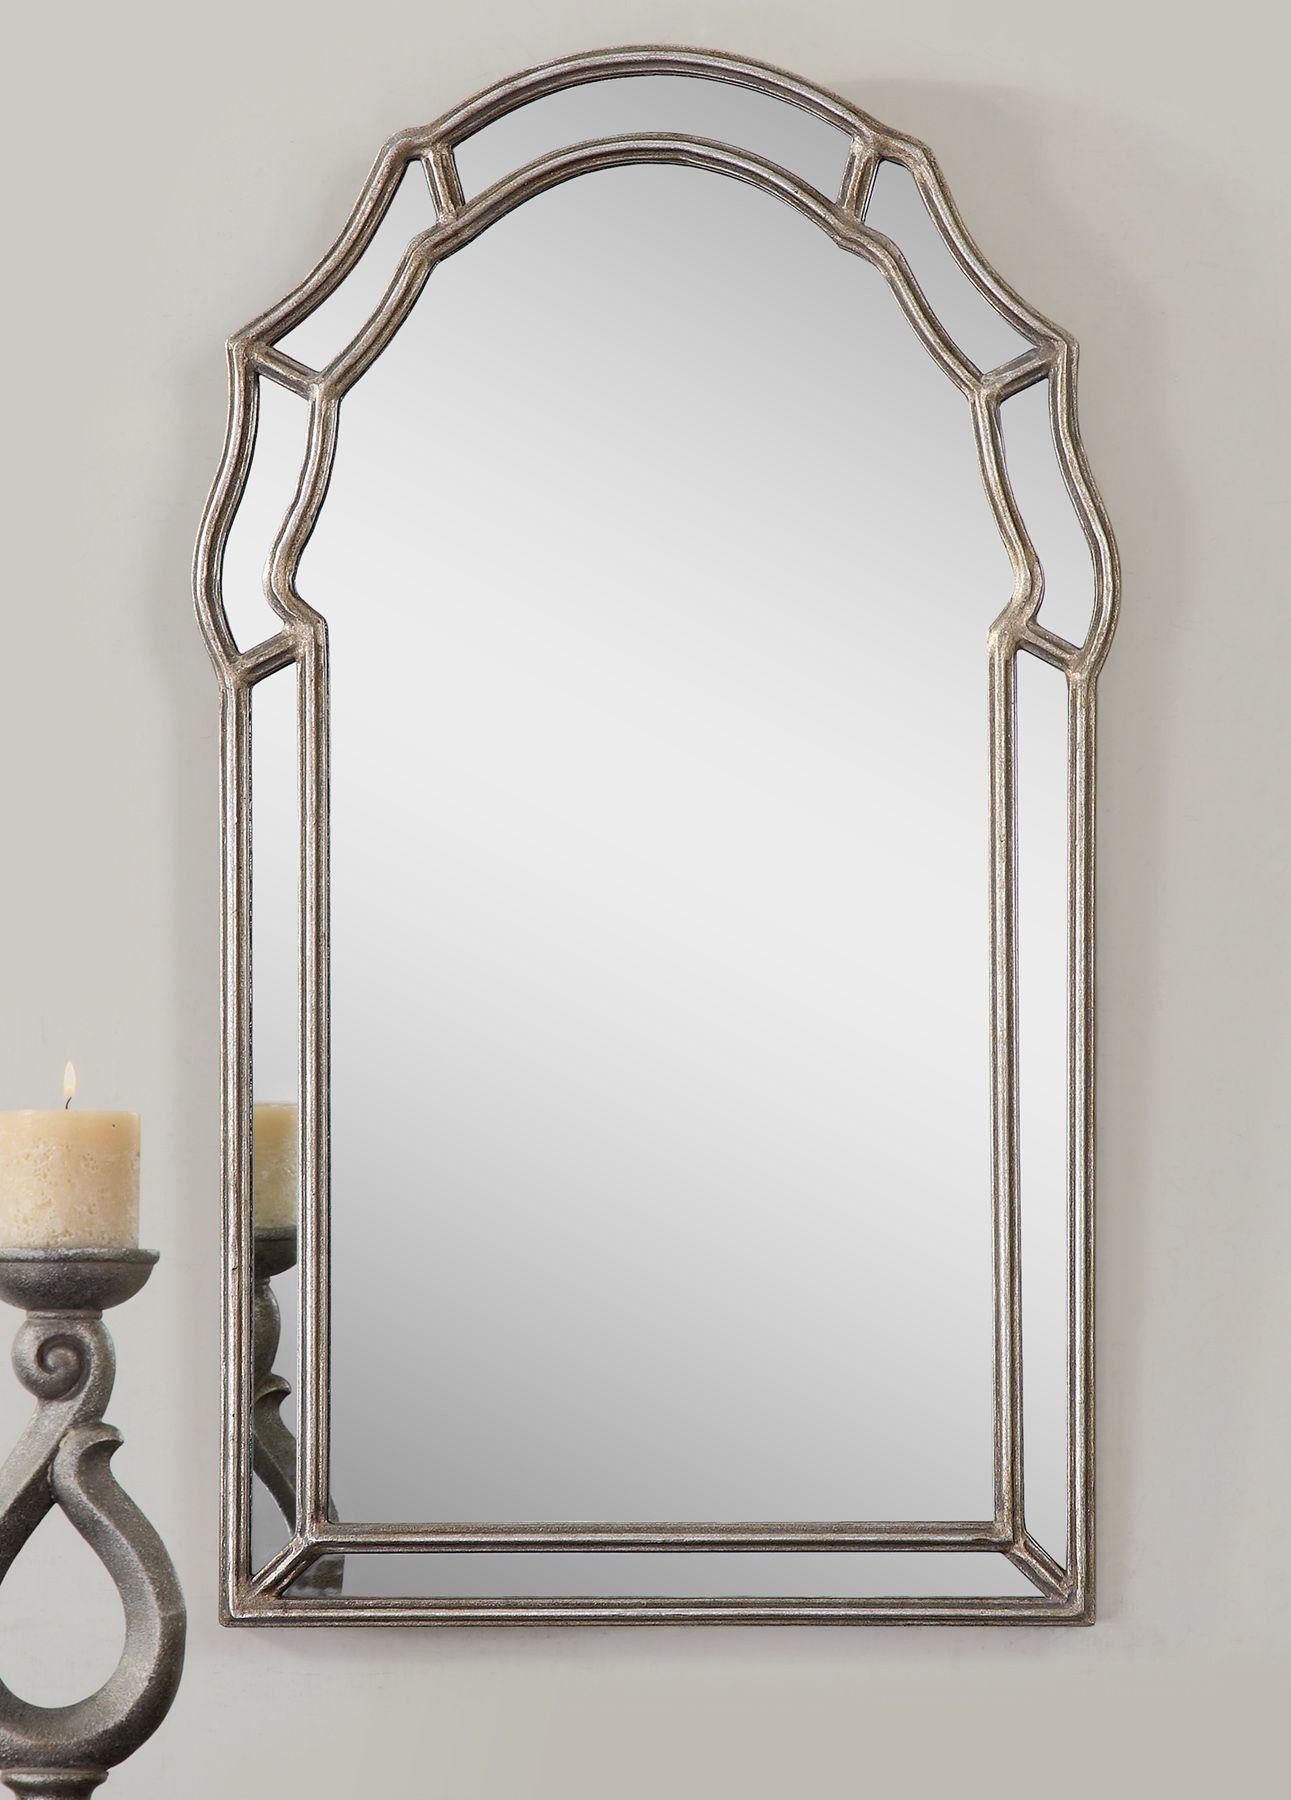 Uttermost Petrizzi Decorative Mirror & Reviews | Wayfair | Ms. H ...